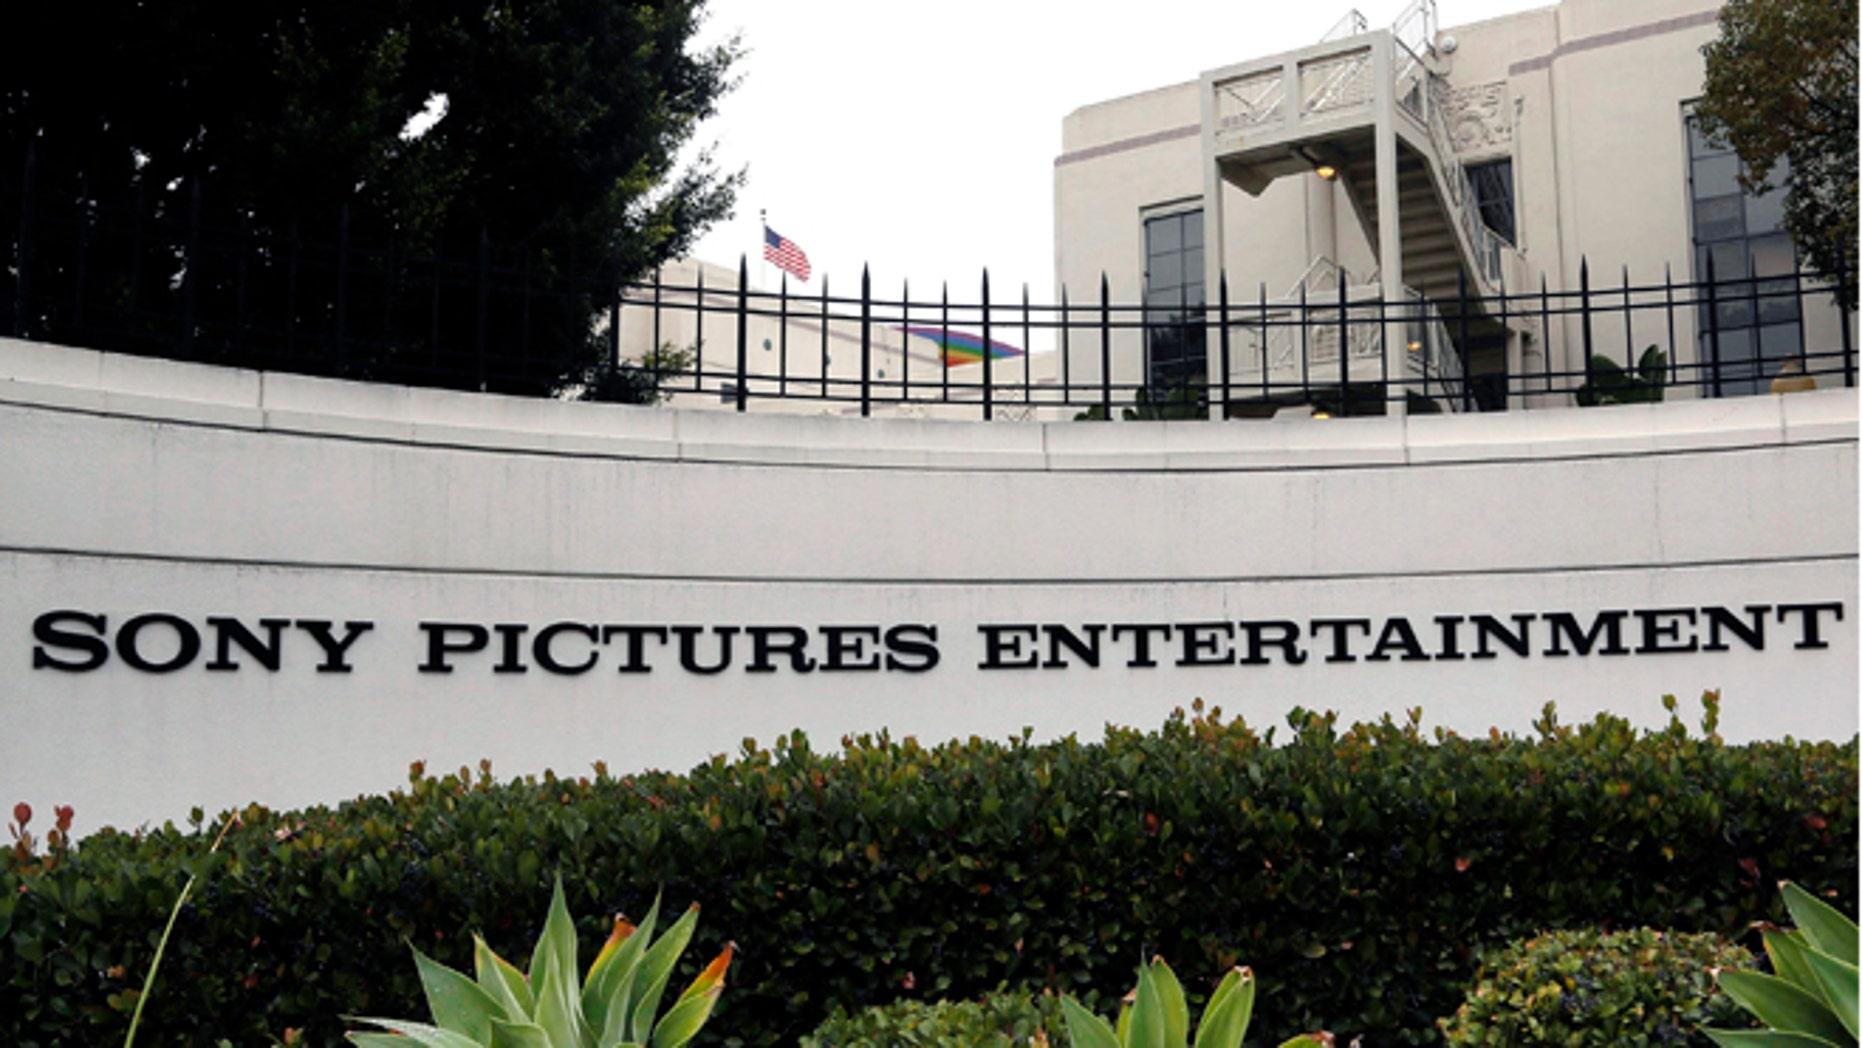 Dec. 2, 2014: Sony Pictures Entertainment headquarters in Culver City, Calif. (AP)